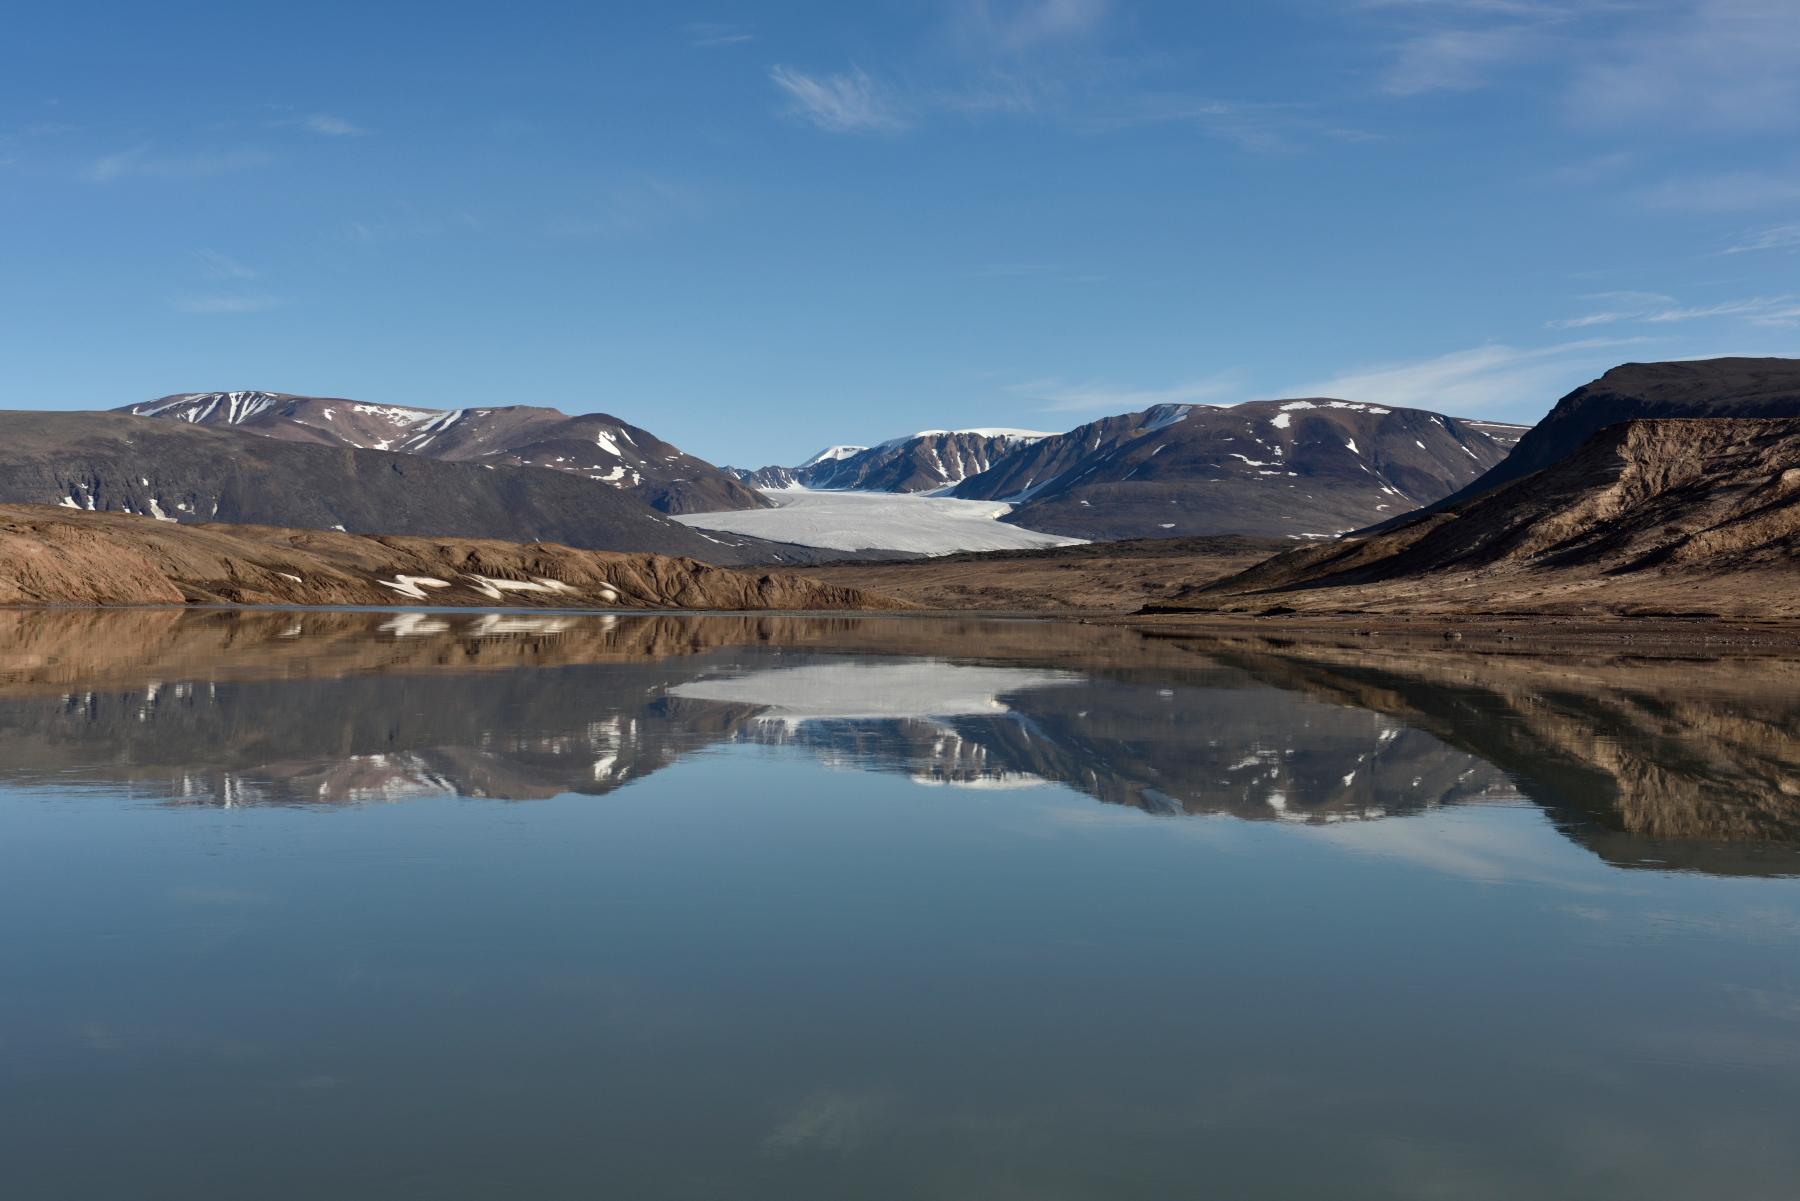 GreenlandCaves_2015_RM_RobbieShone0636.JPG